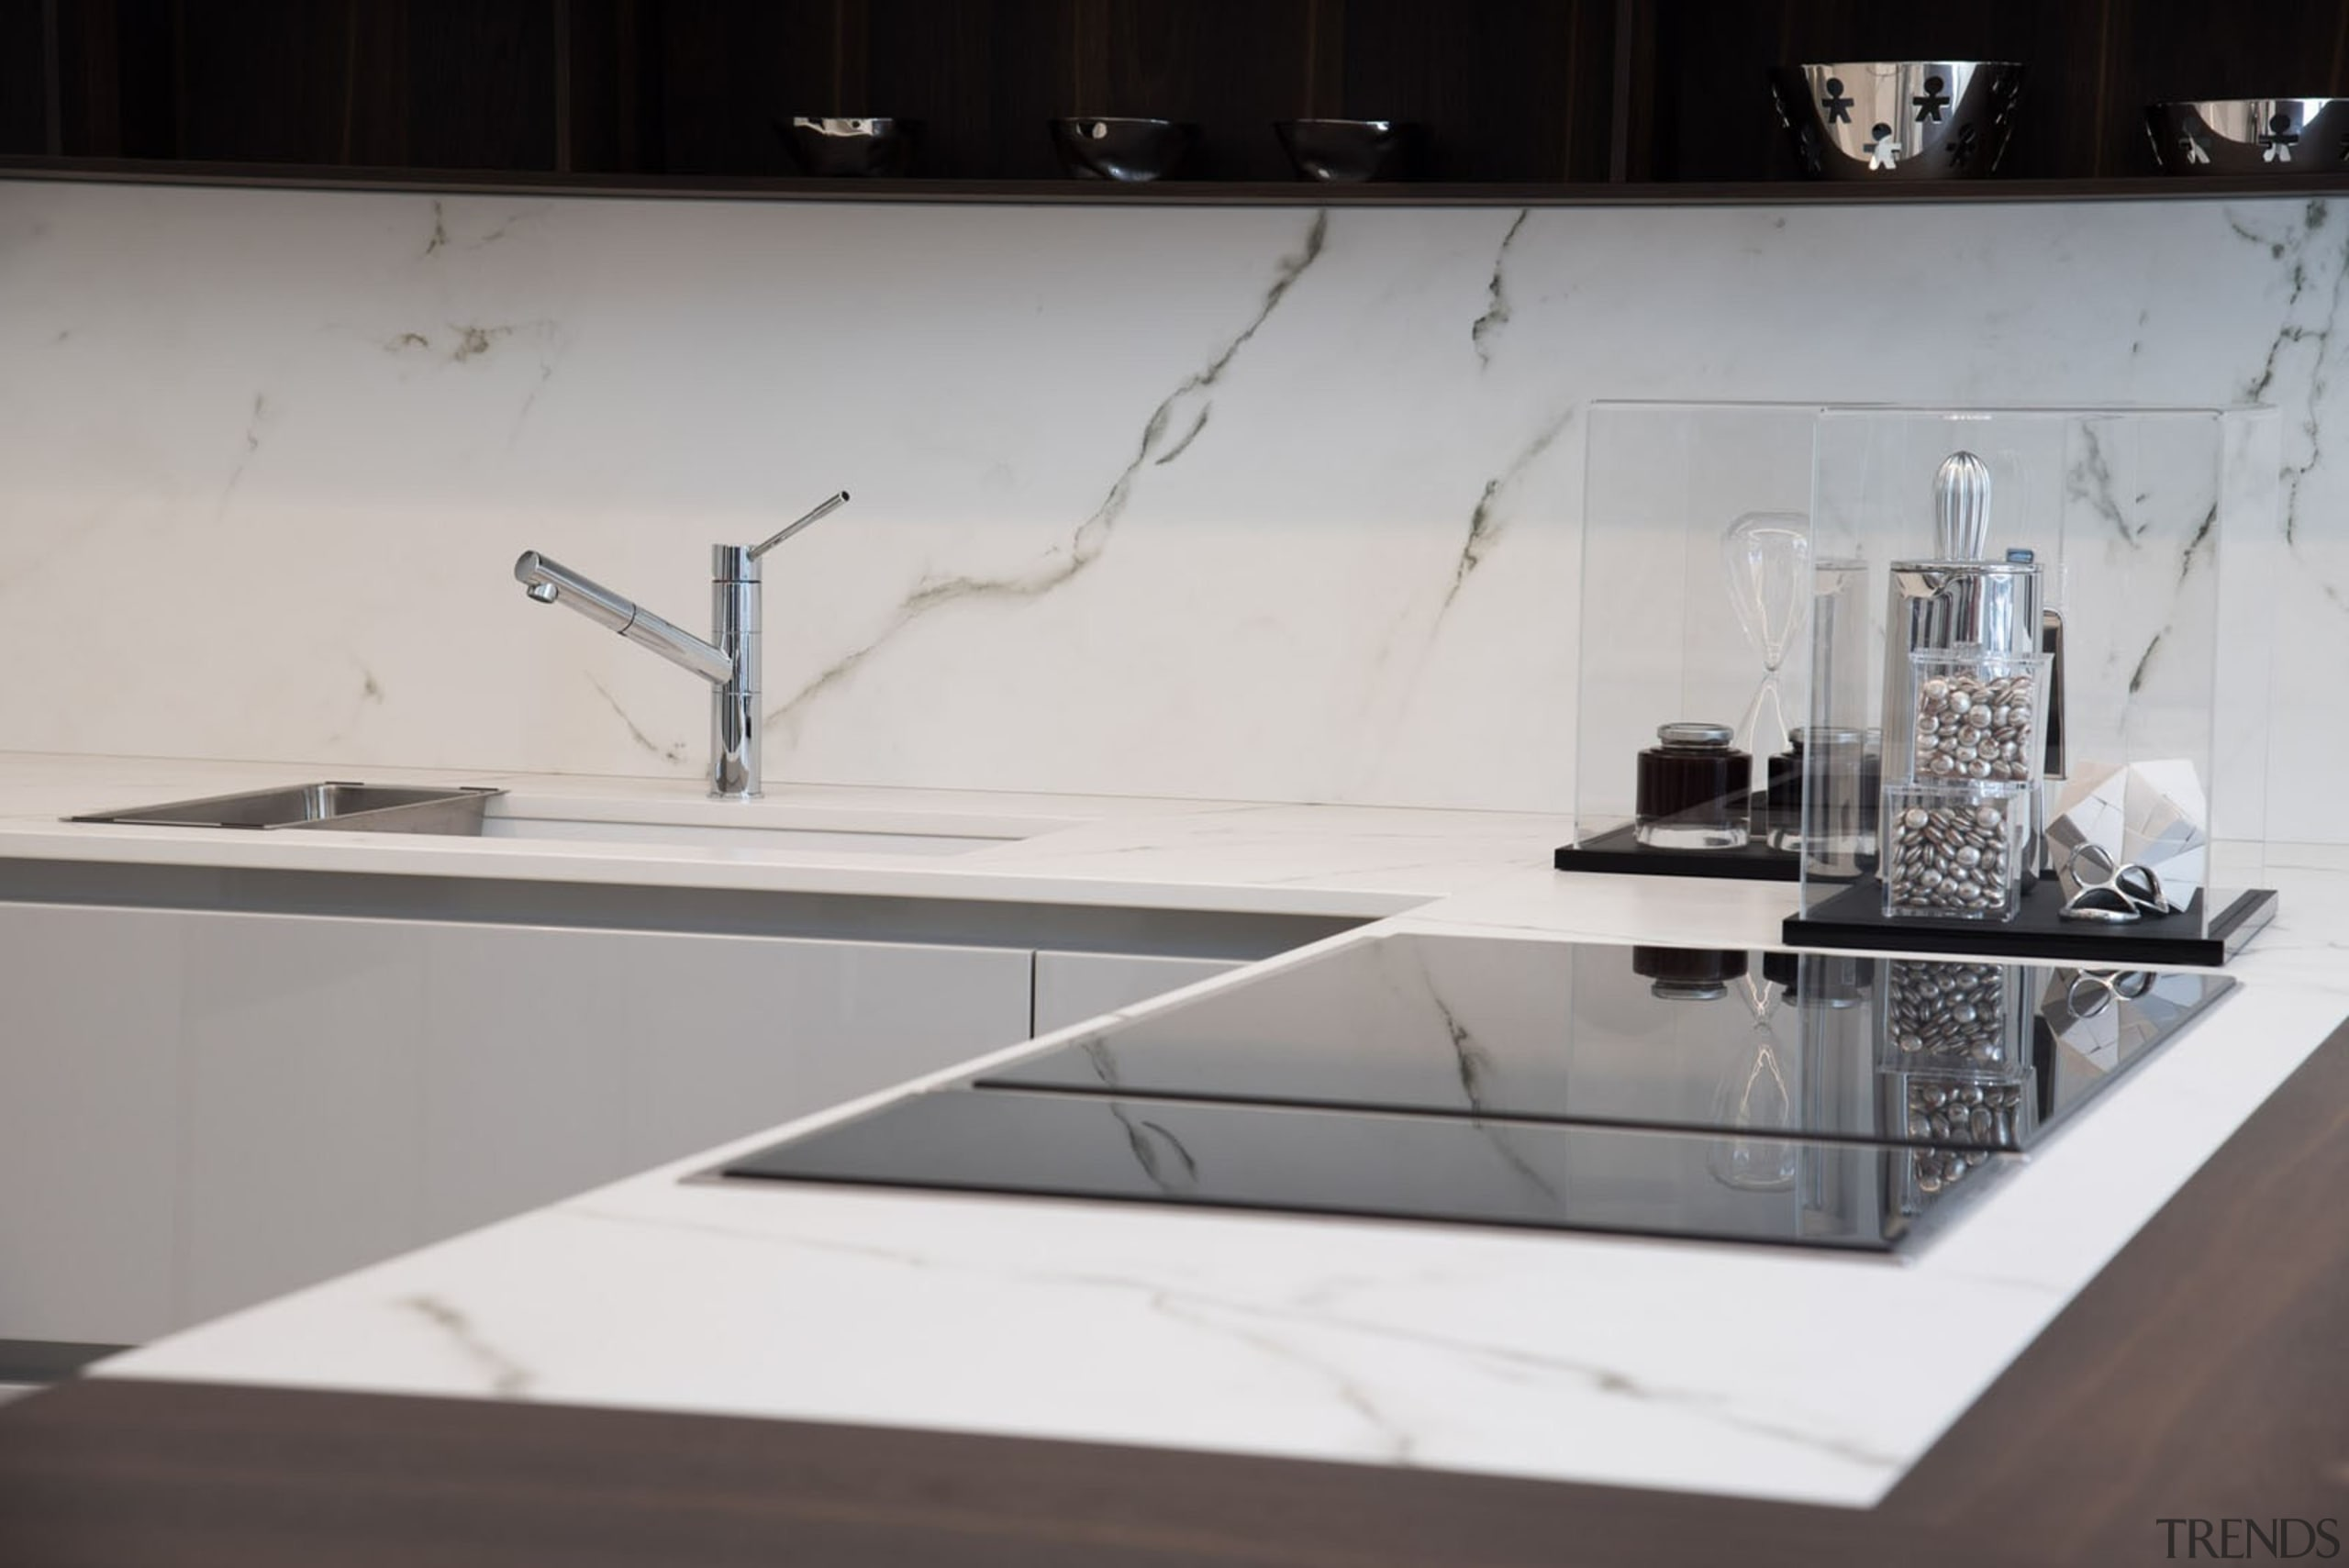 Dekton® Kairos countertop and splashback Aster showroom Milan architecture, countertop, design, furniture, glass, product design, table, gray